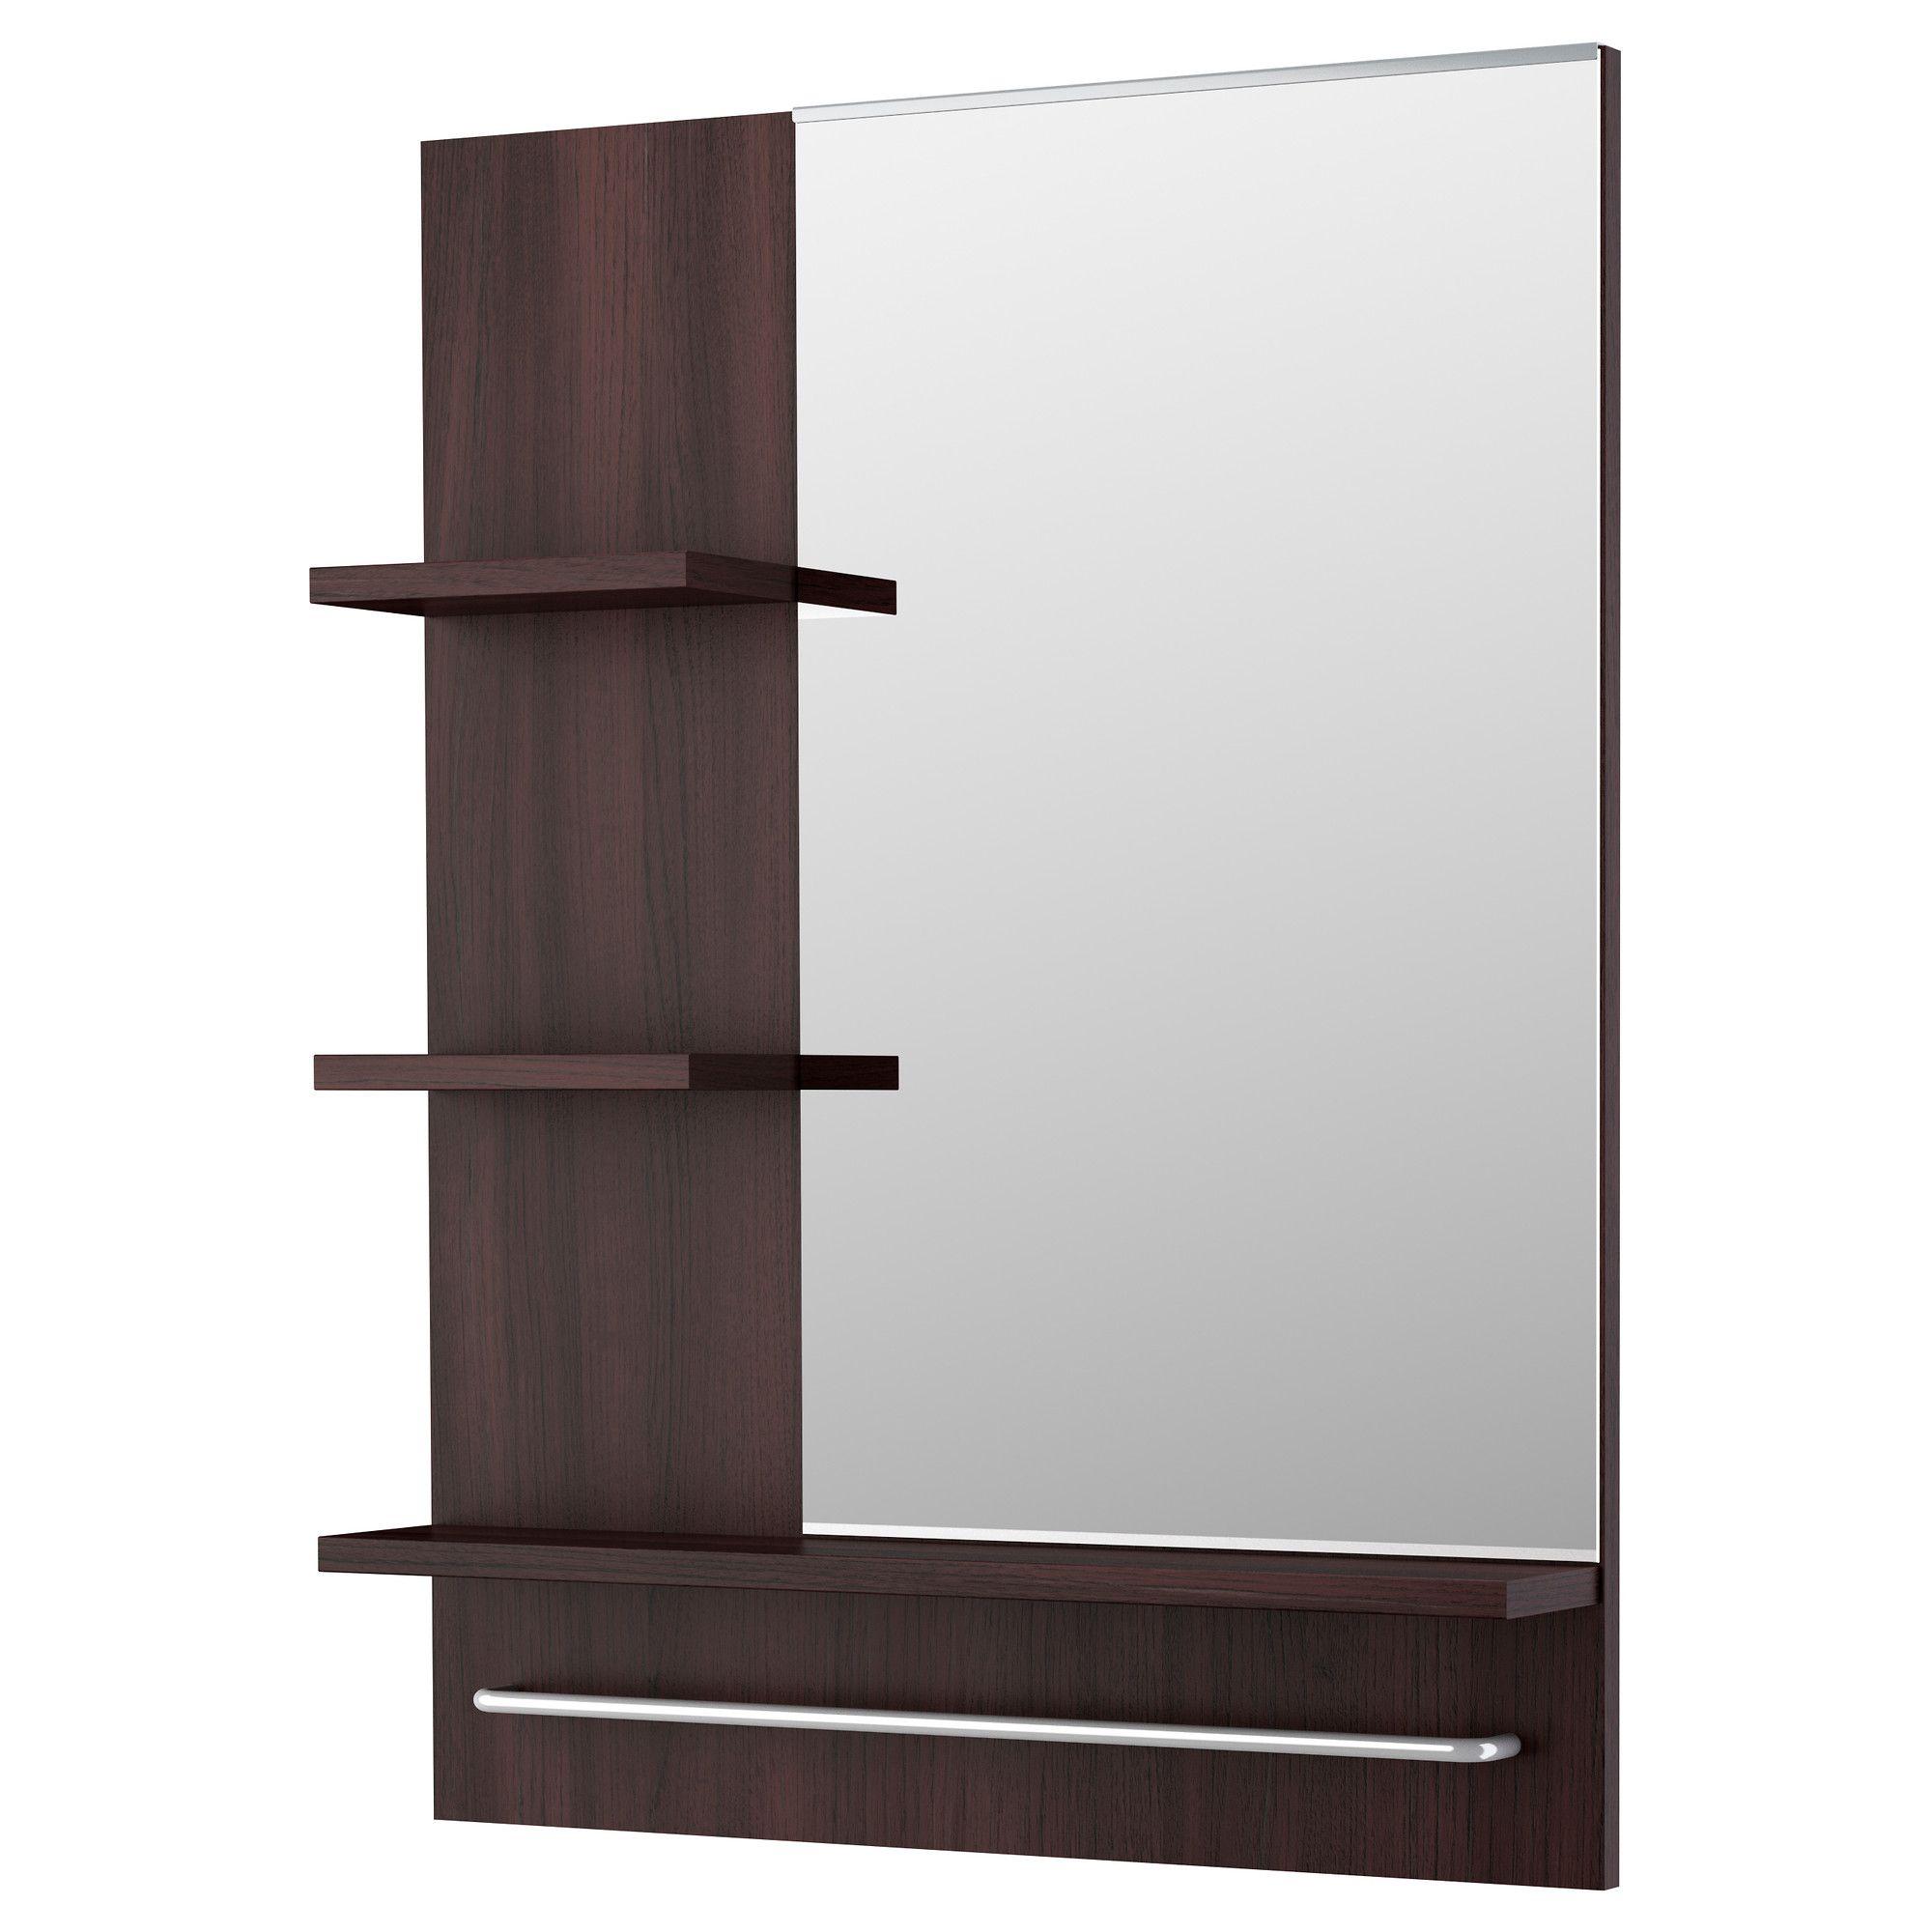 Furniture Home Furnishings Find Your Inspiration Bathroom Mirror With Shelf Ikea Bathroom Mirror Modern Bathroom Mirrors